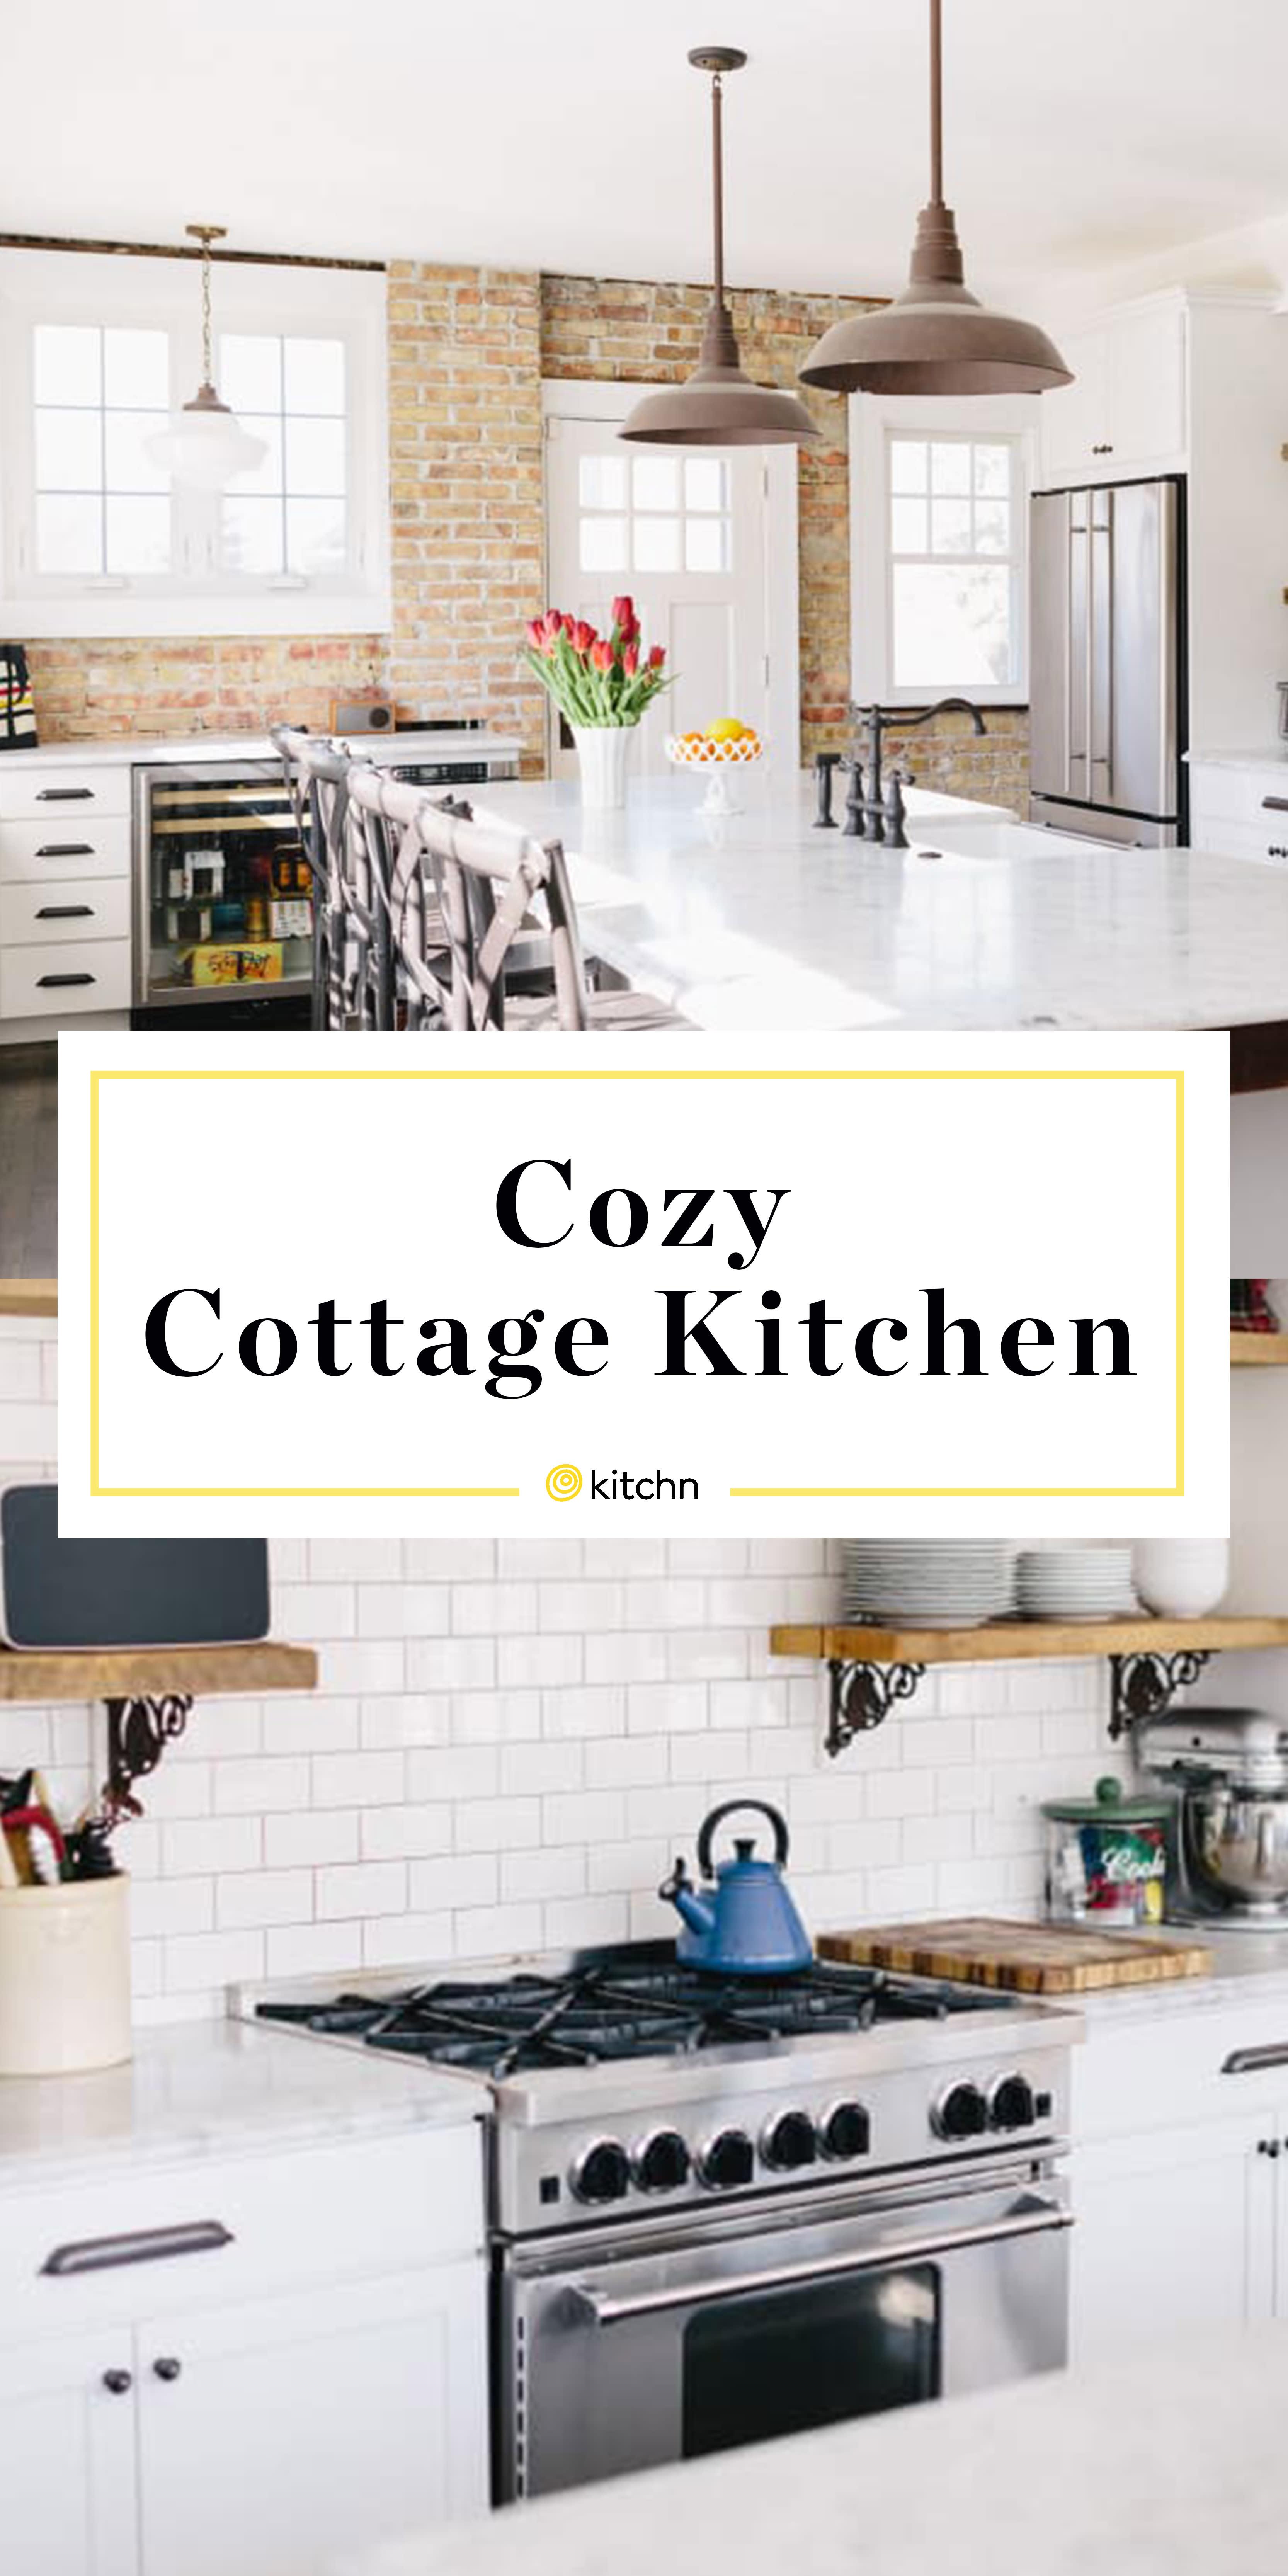 Cozy Cottage Kitchen Decorating Ideas   Kitchn